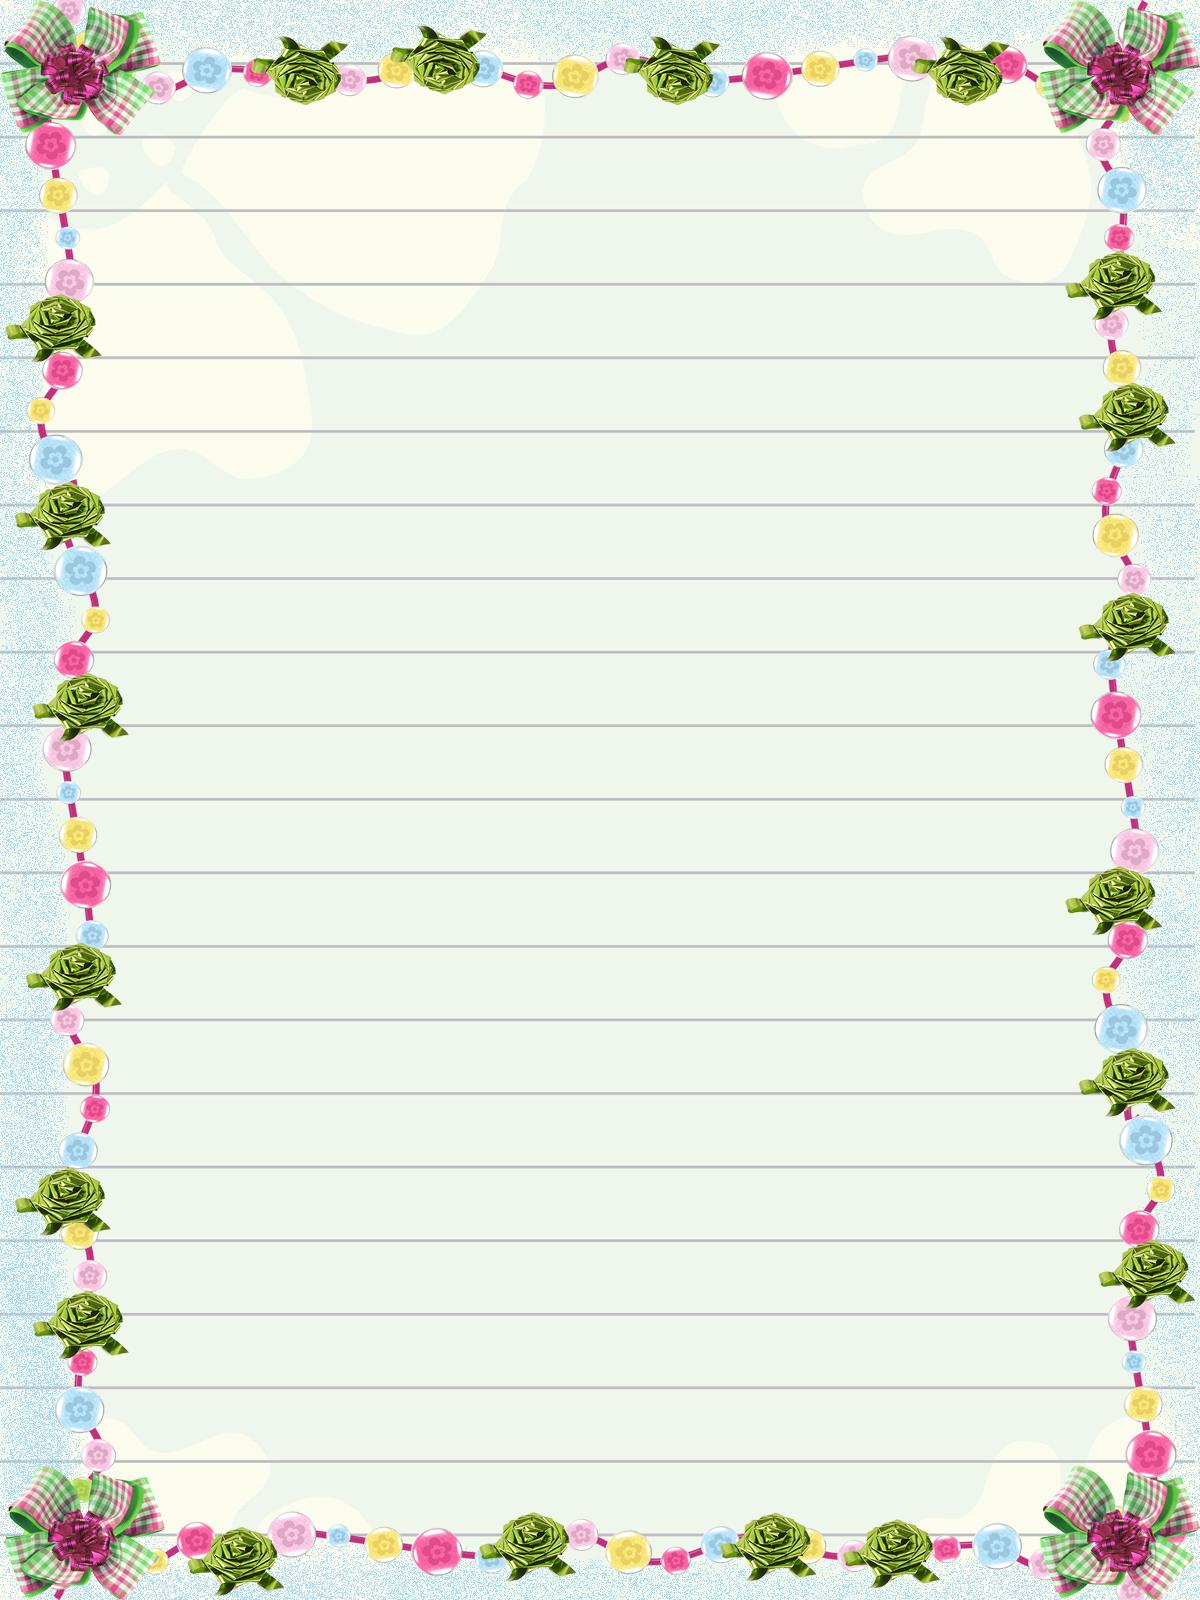 Papel de carta png 4 » PNG Image.